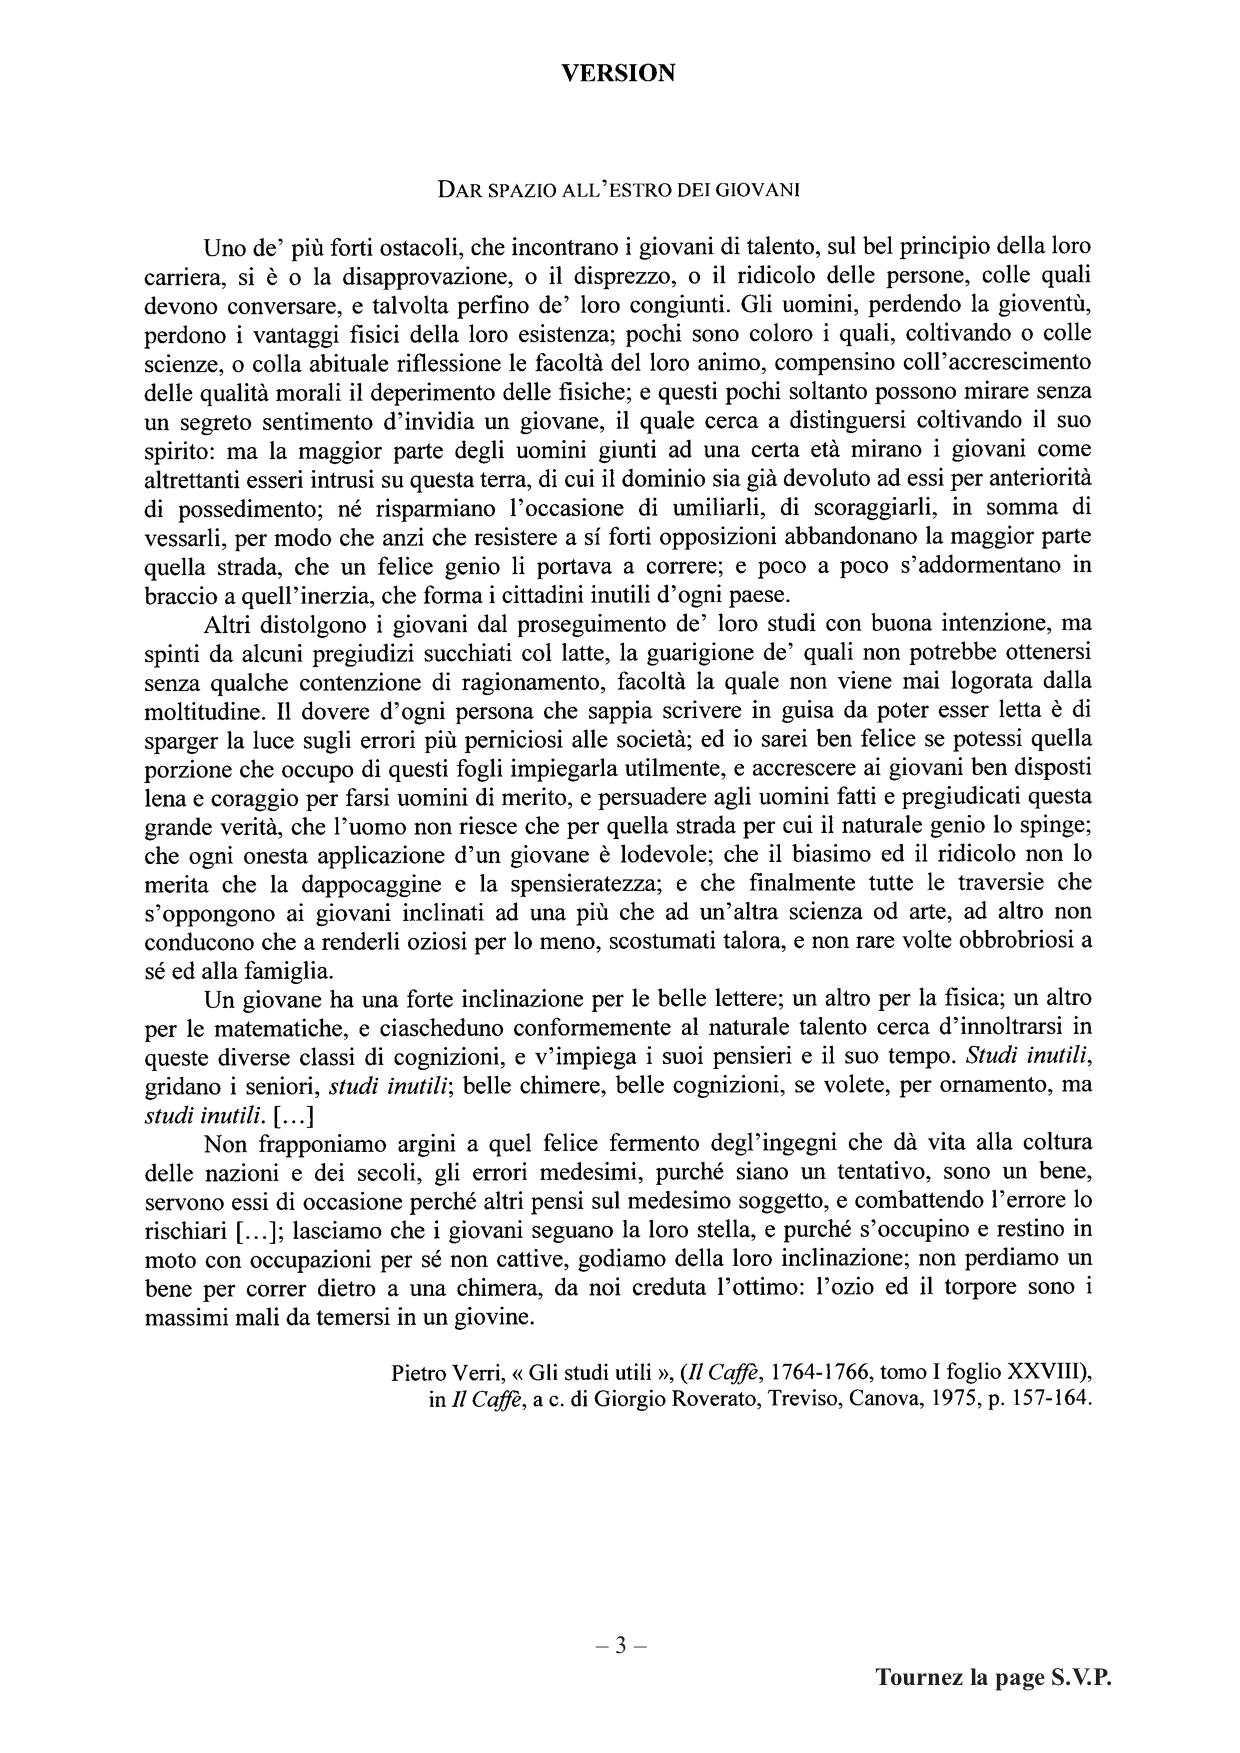 version agreg 2020